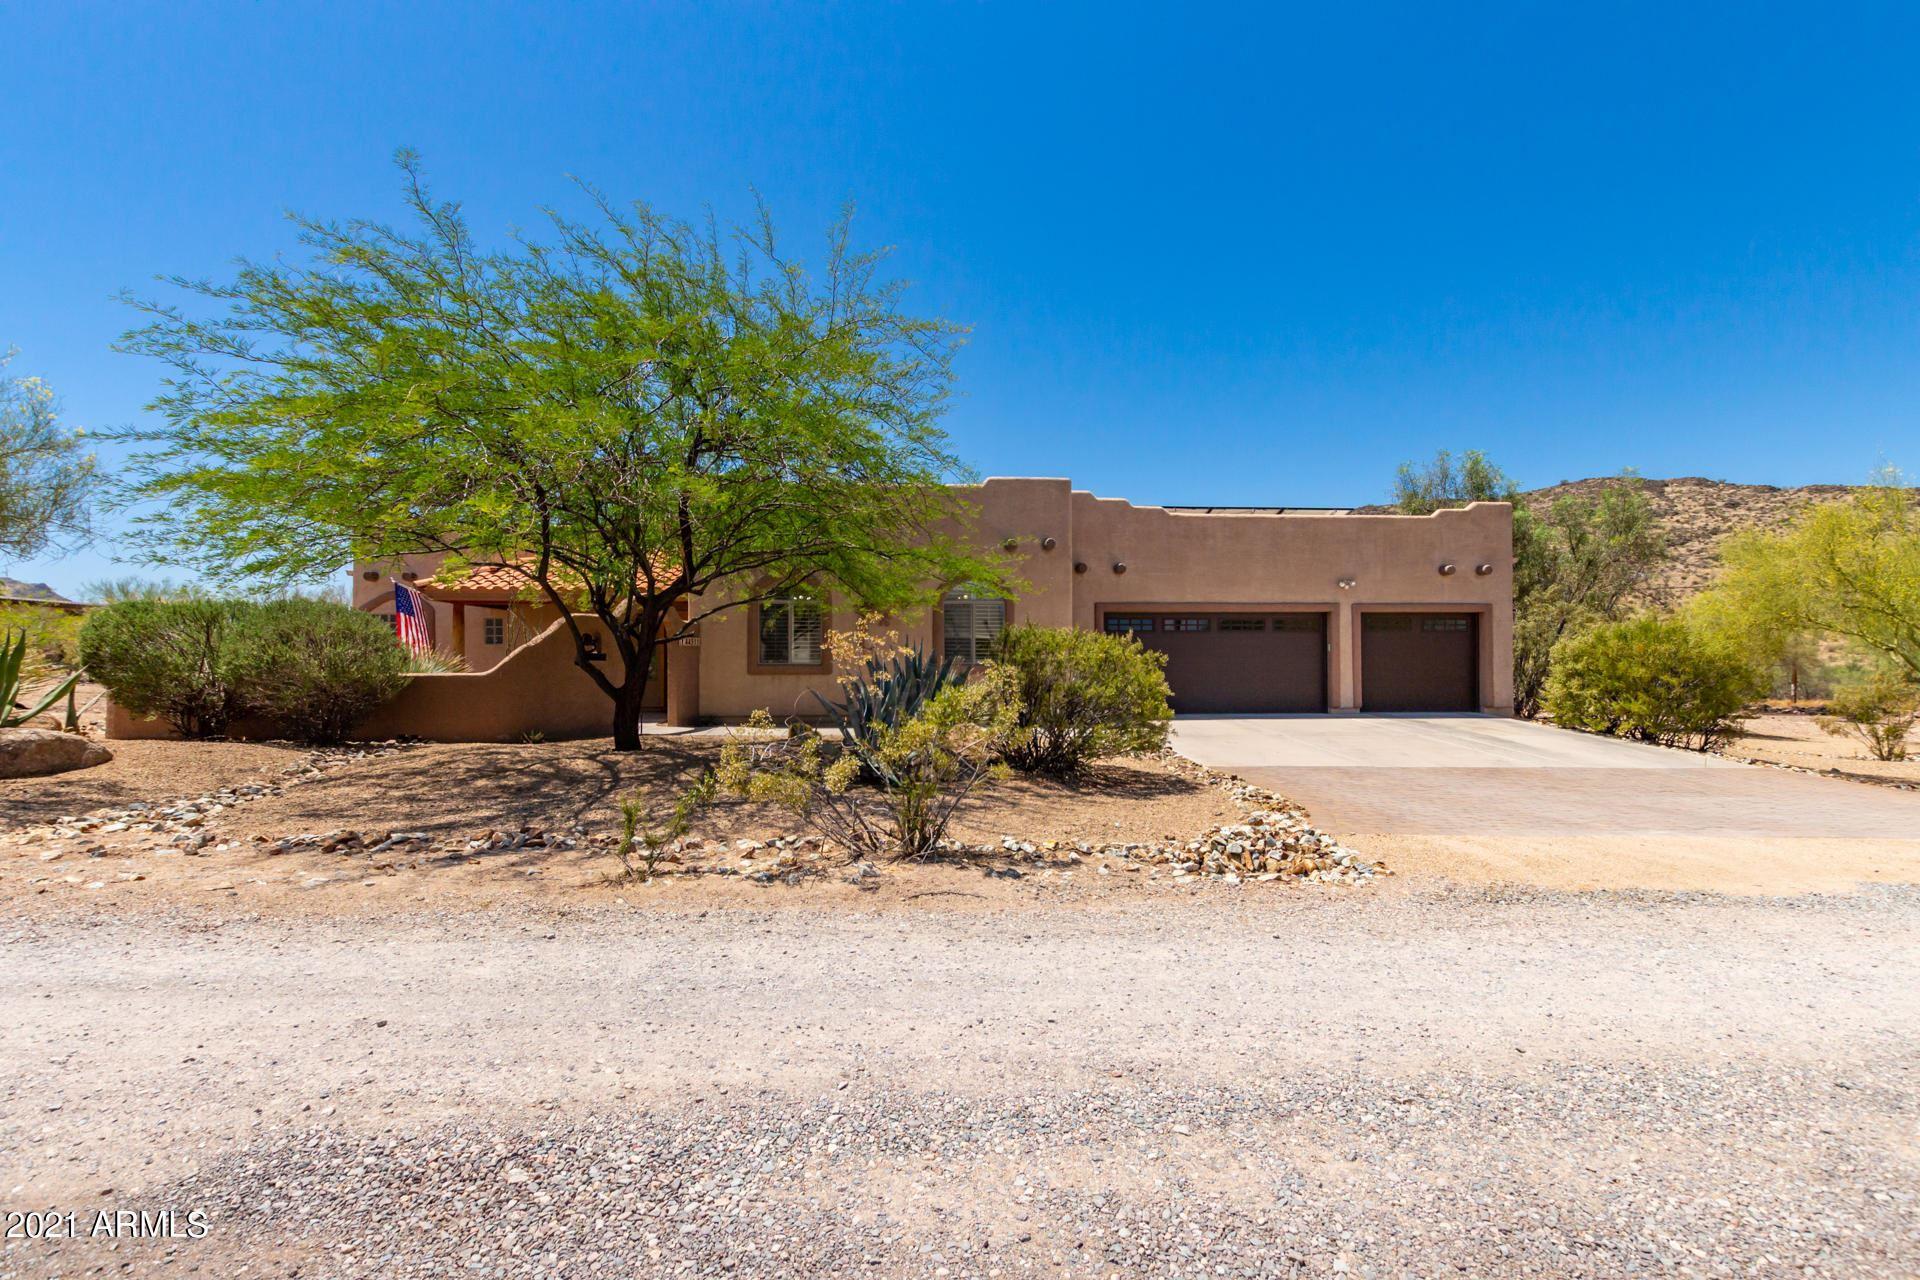 Photo of 44511 N 10TH Street, New River, AZ 85087 (MLS # 6246970)